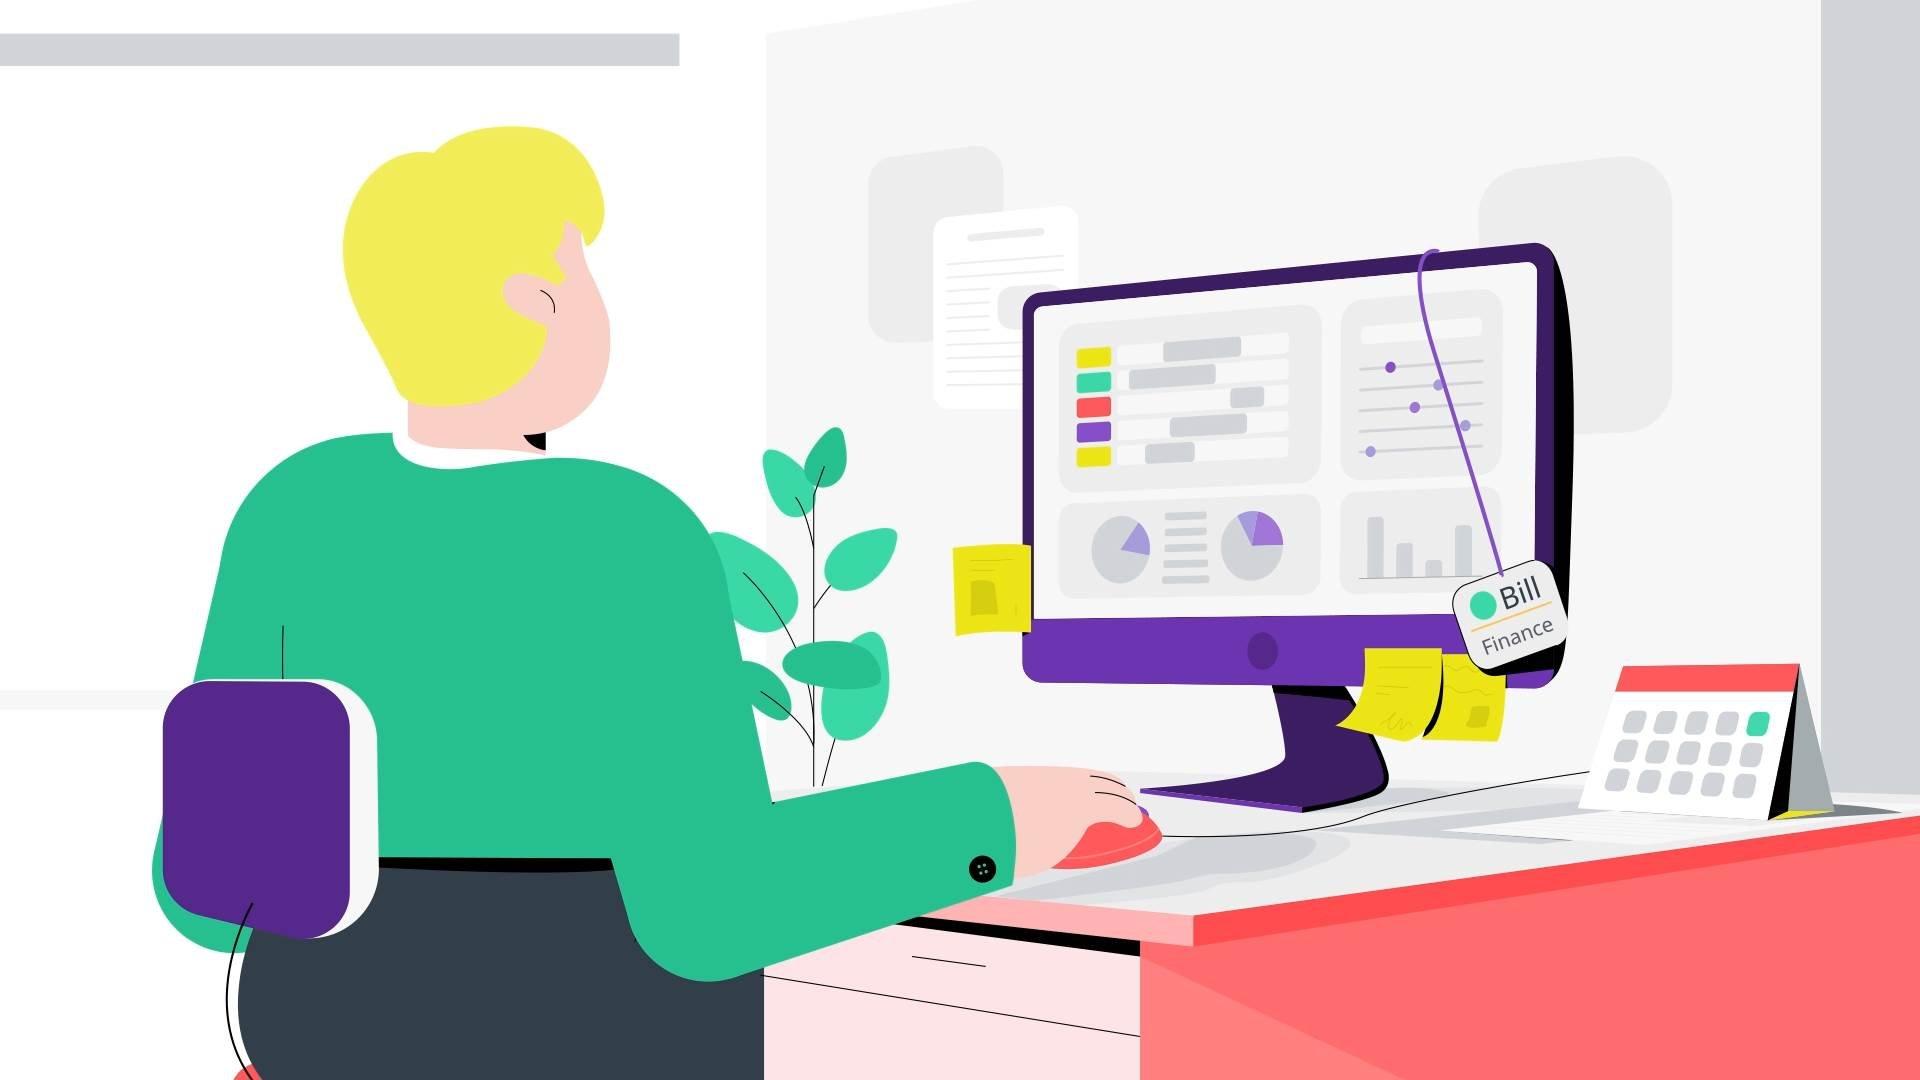 Quorso animated explainer video